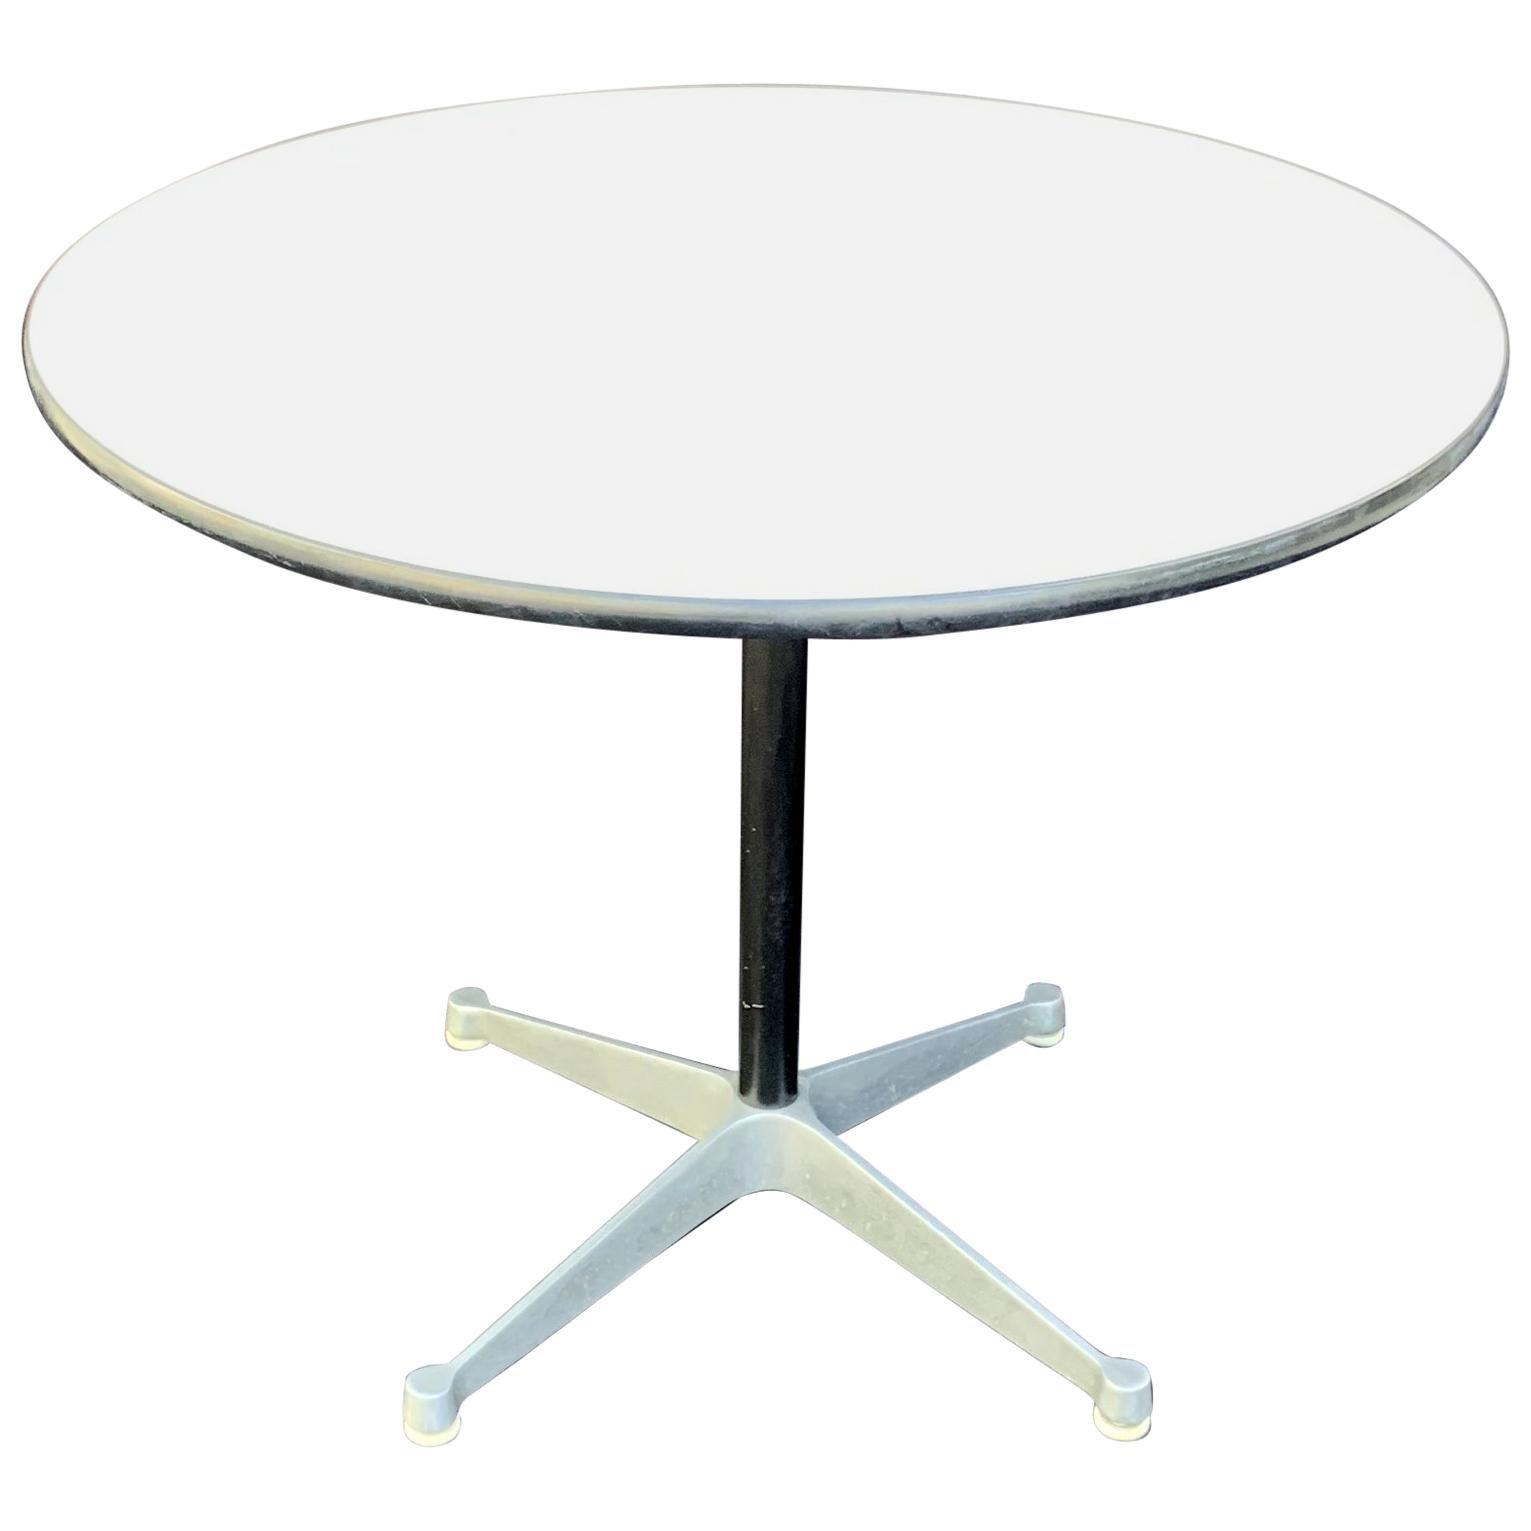 Wonderful Mid-Century Modern Herman Miller Round Pedestal Table